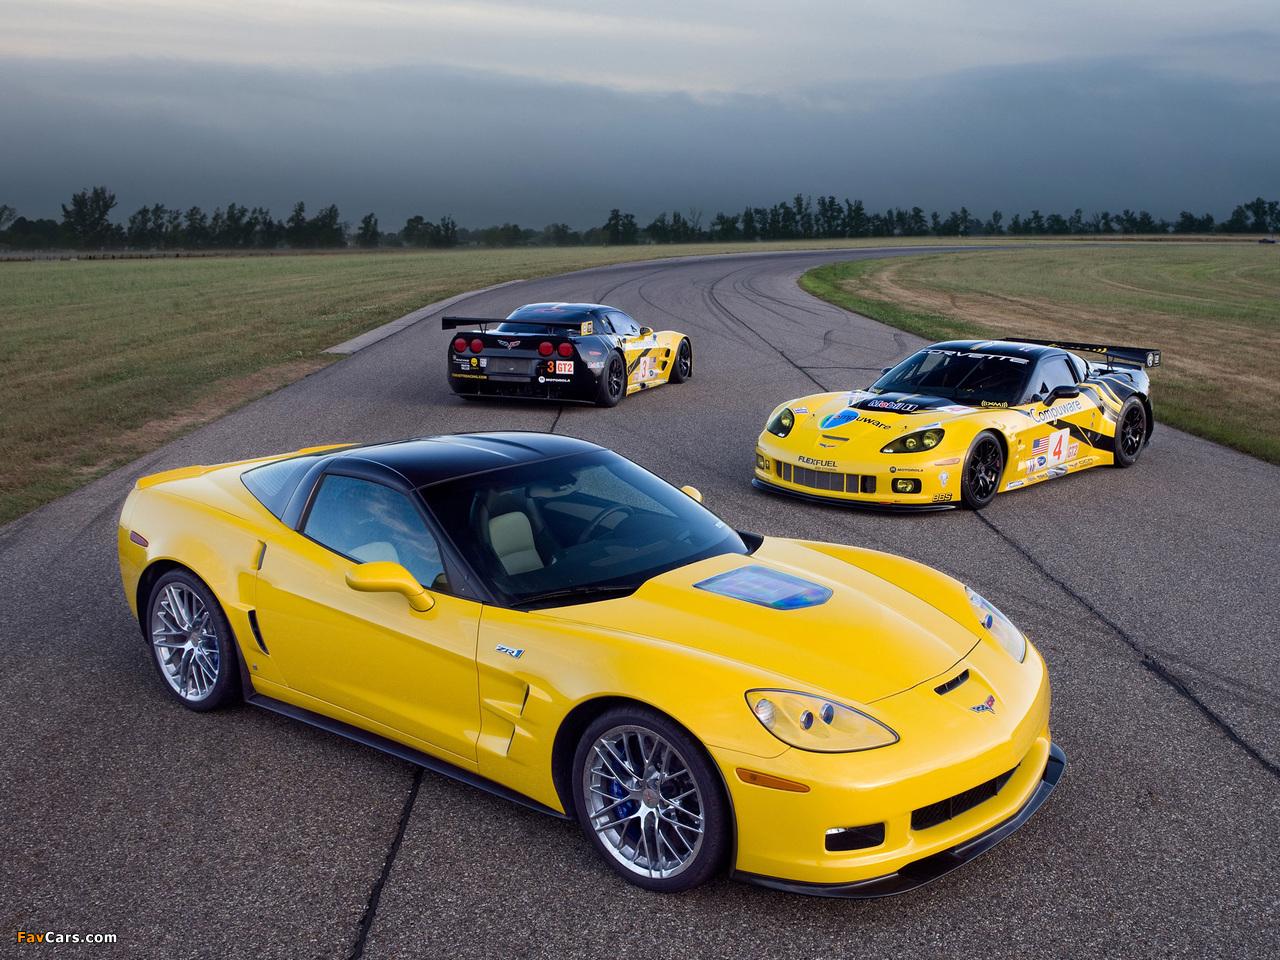 Pictures of Corvette (1280 x 960)